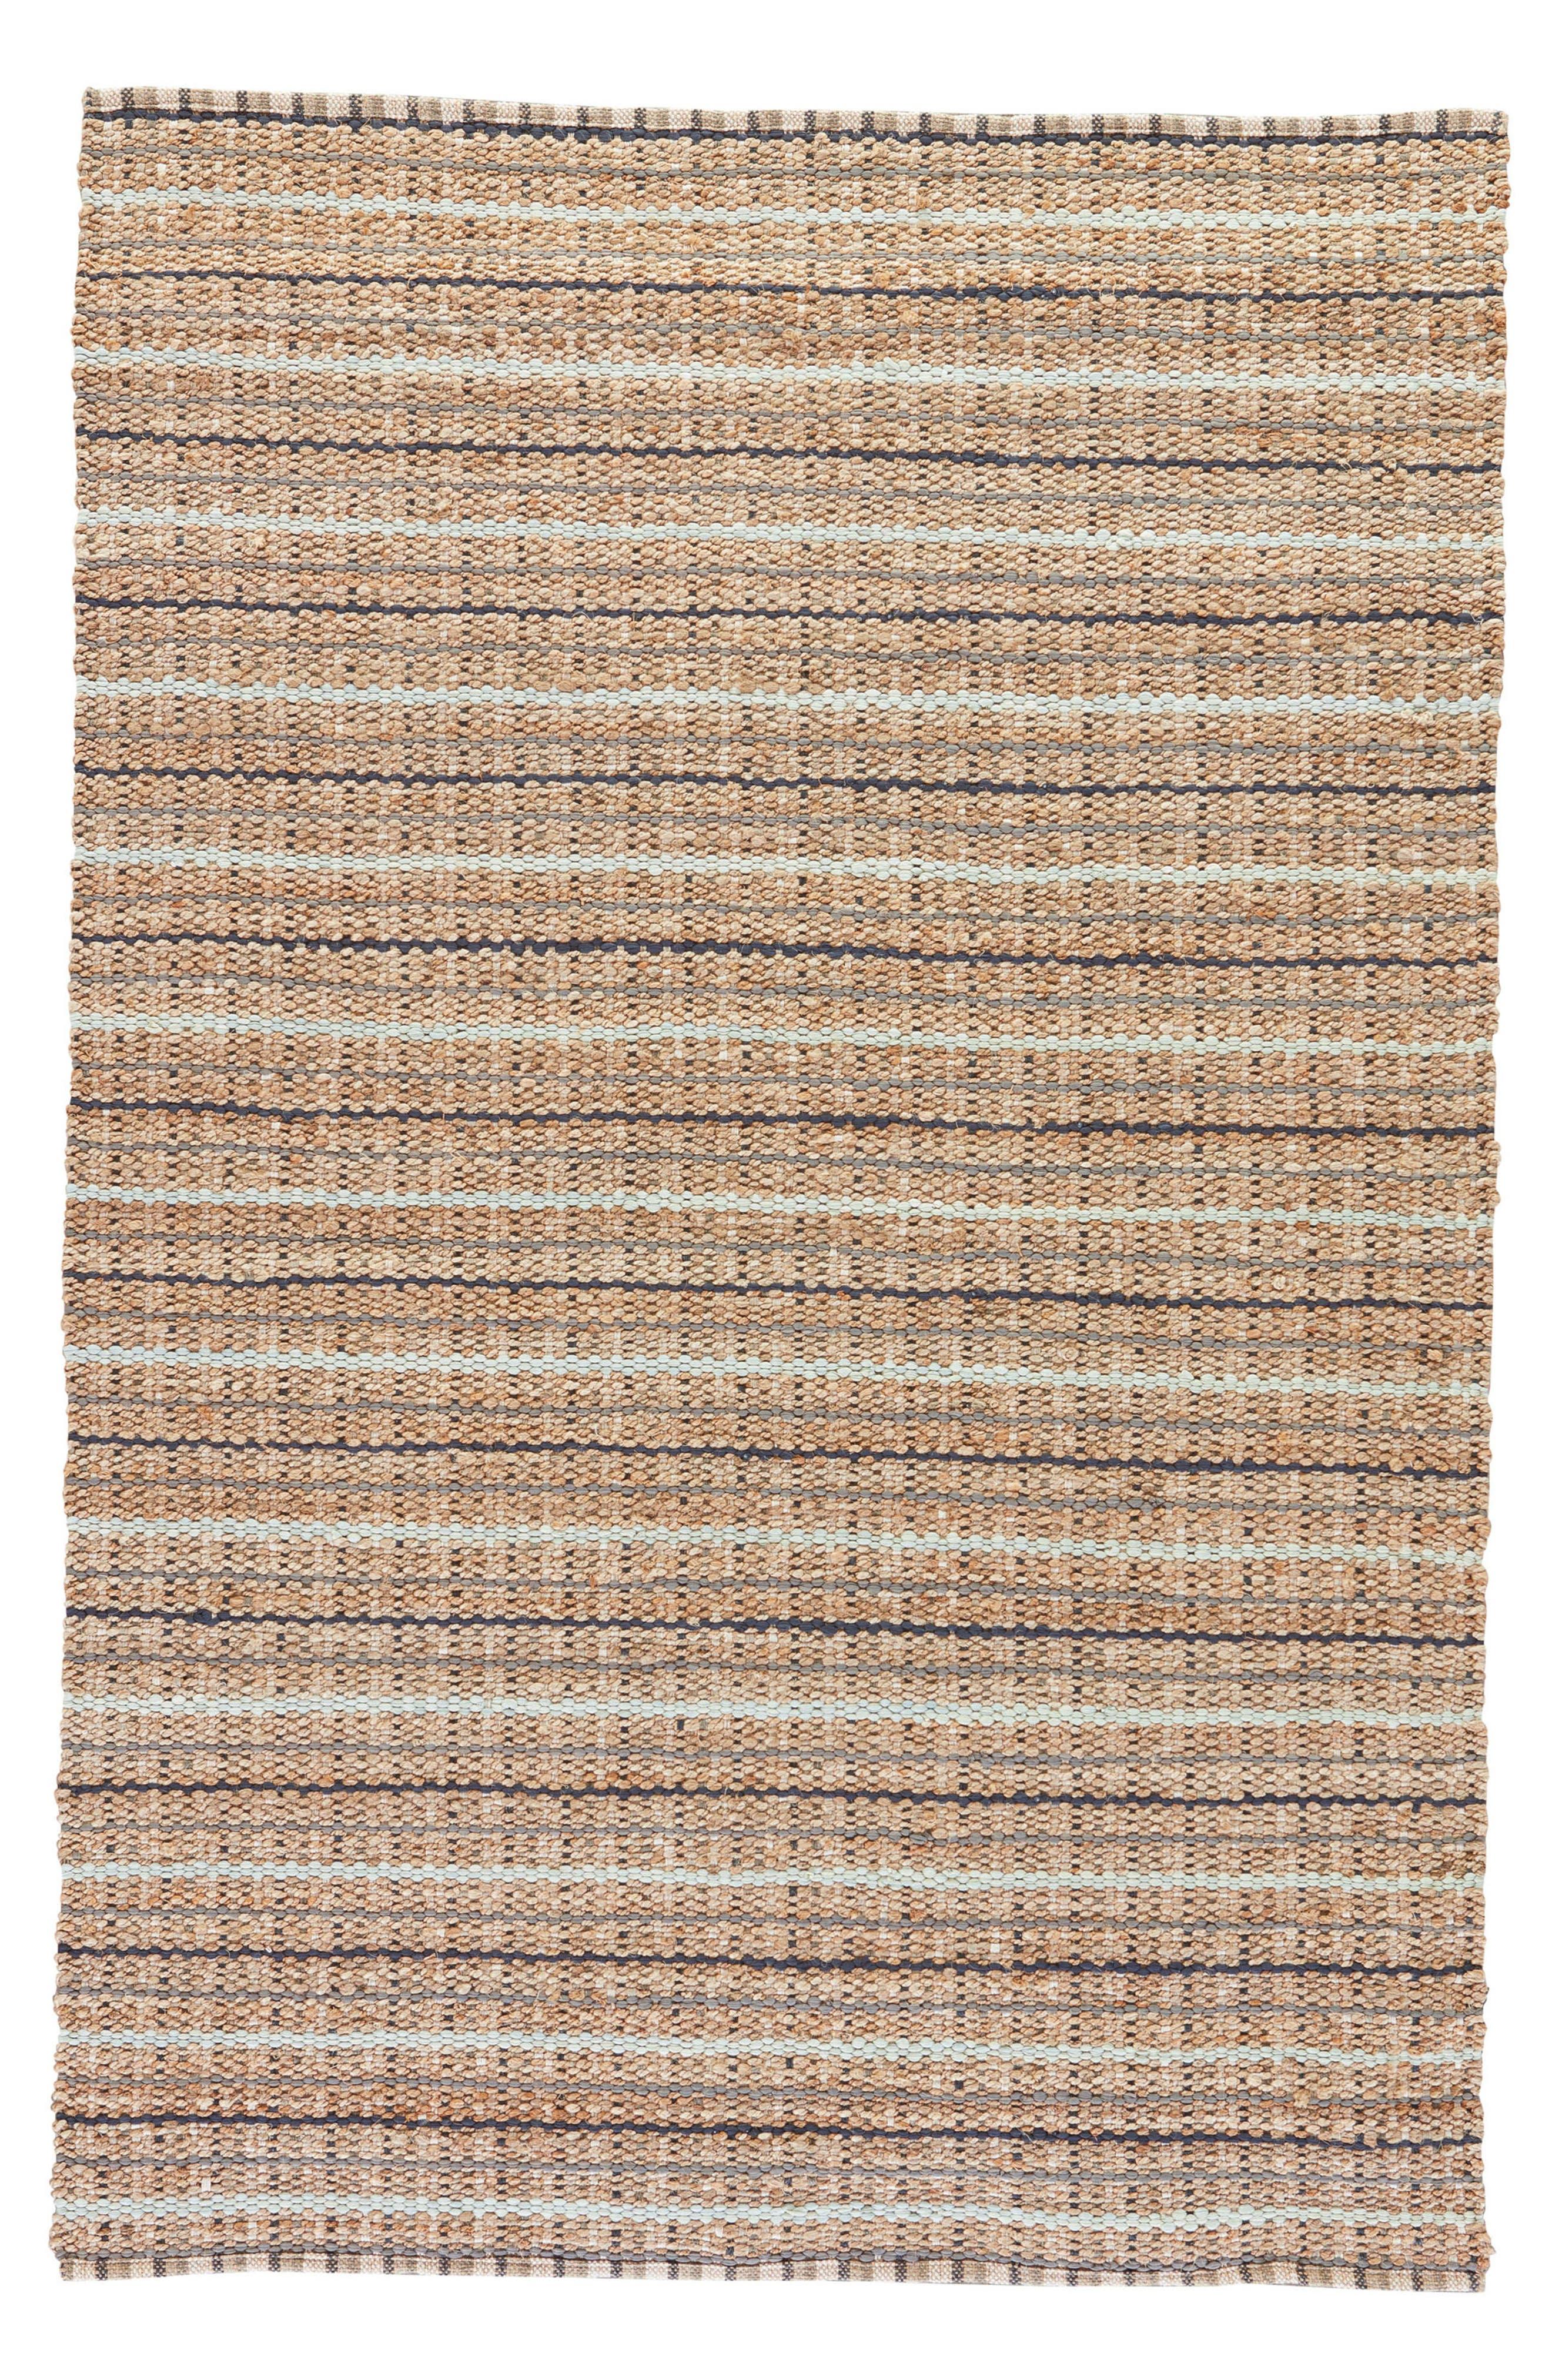 Jaipur Andes Jute & Cotton Rug